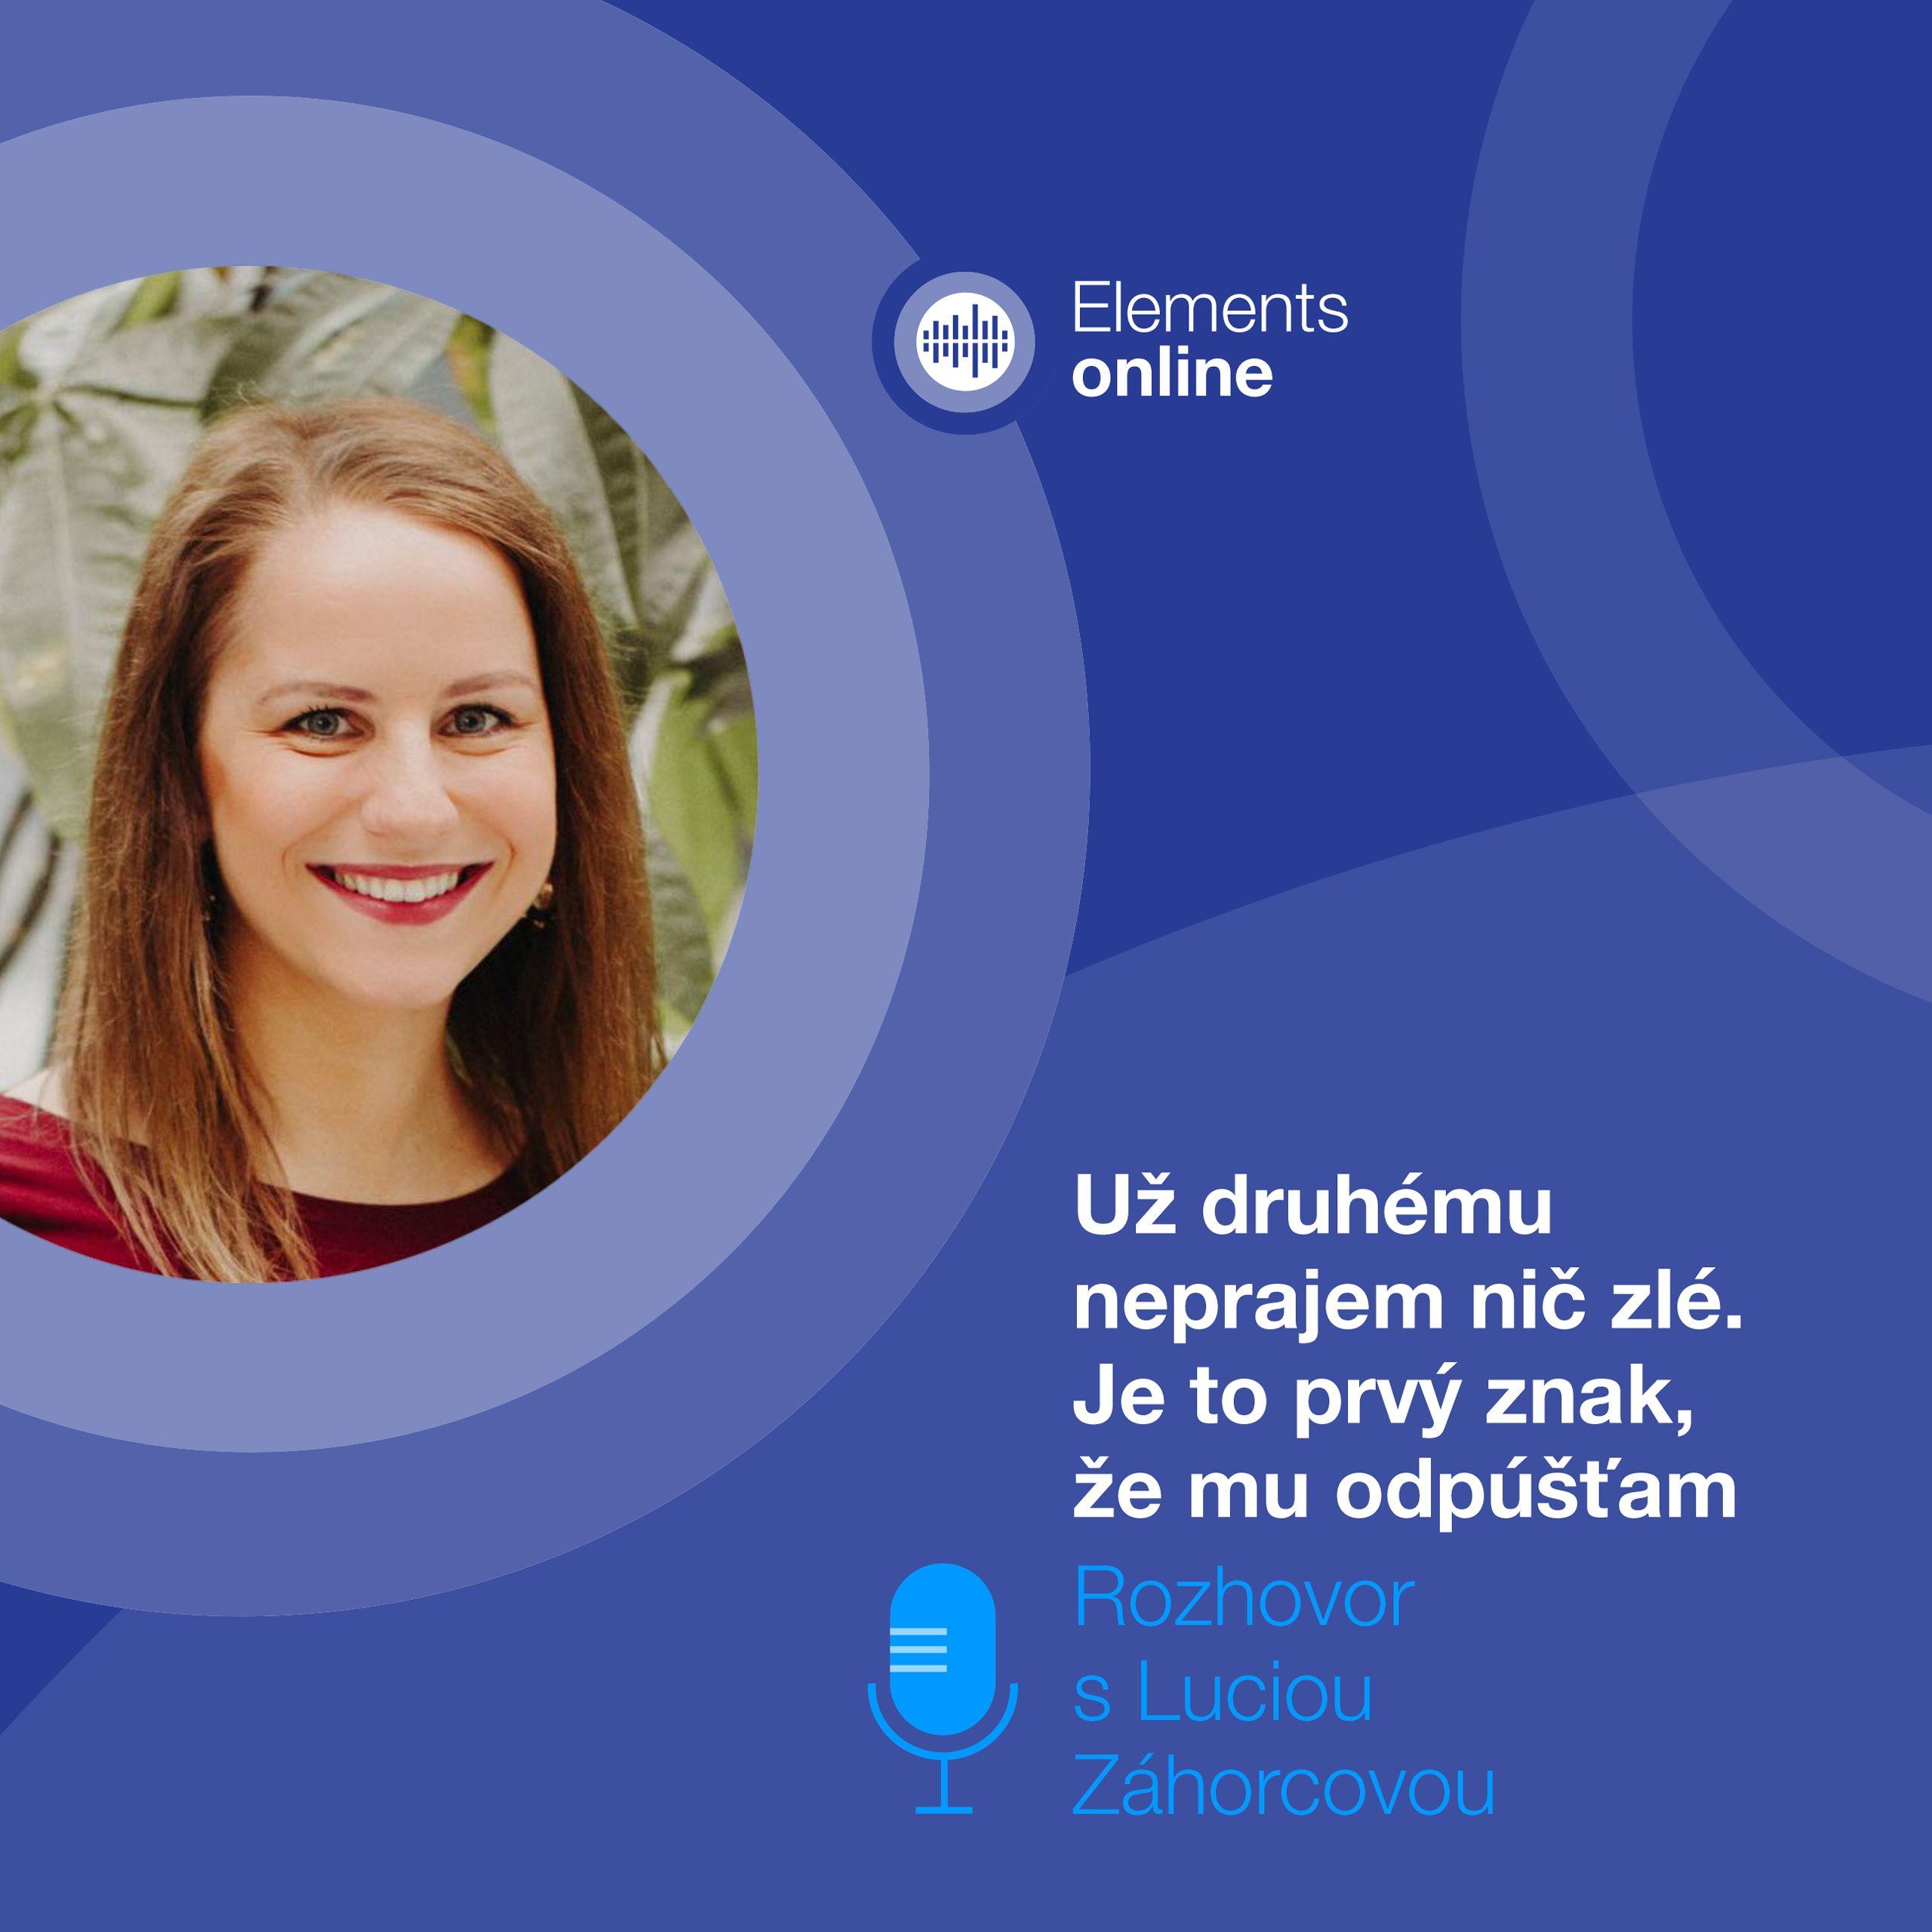 pe-banner-rozhovor-lucia-zahorcova-2020-06-05-1920x1920@2x-c